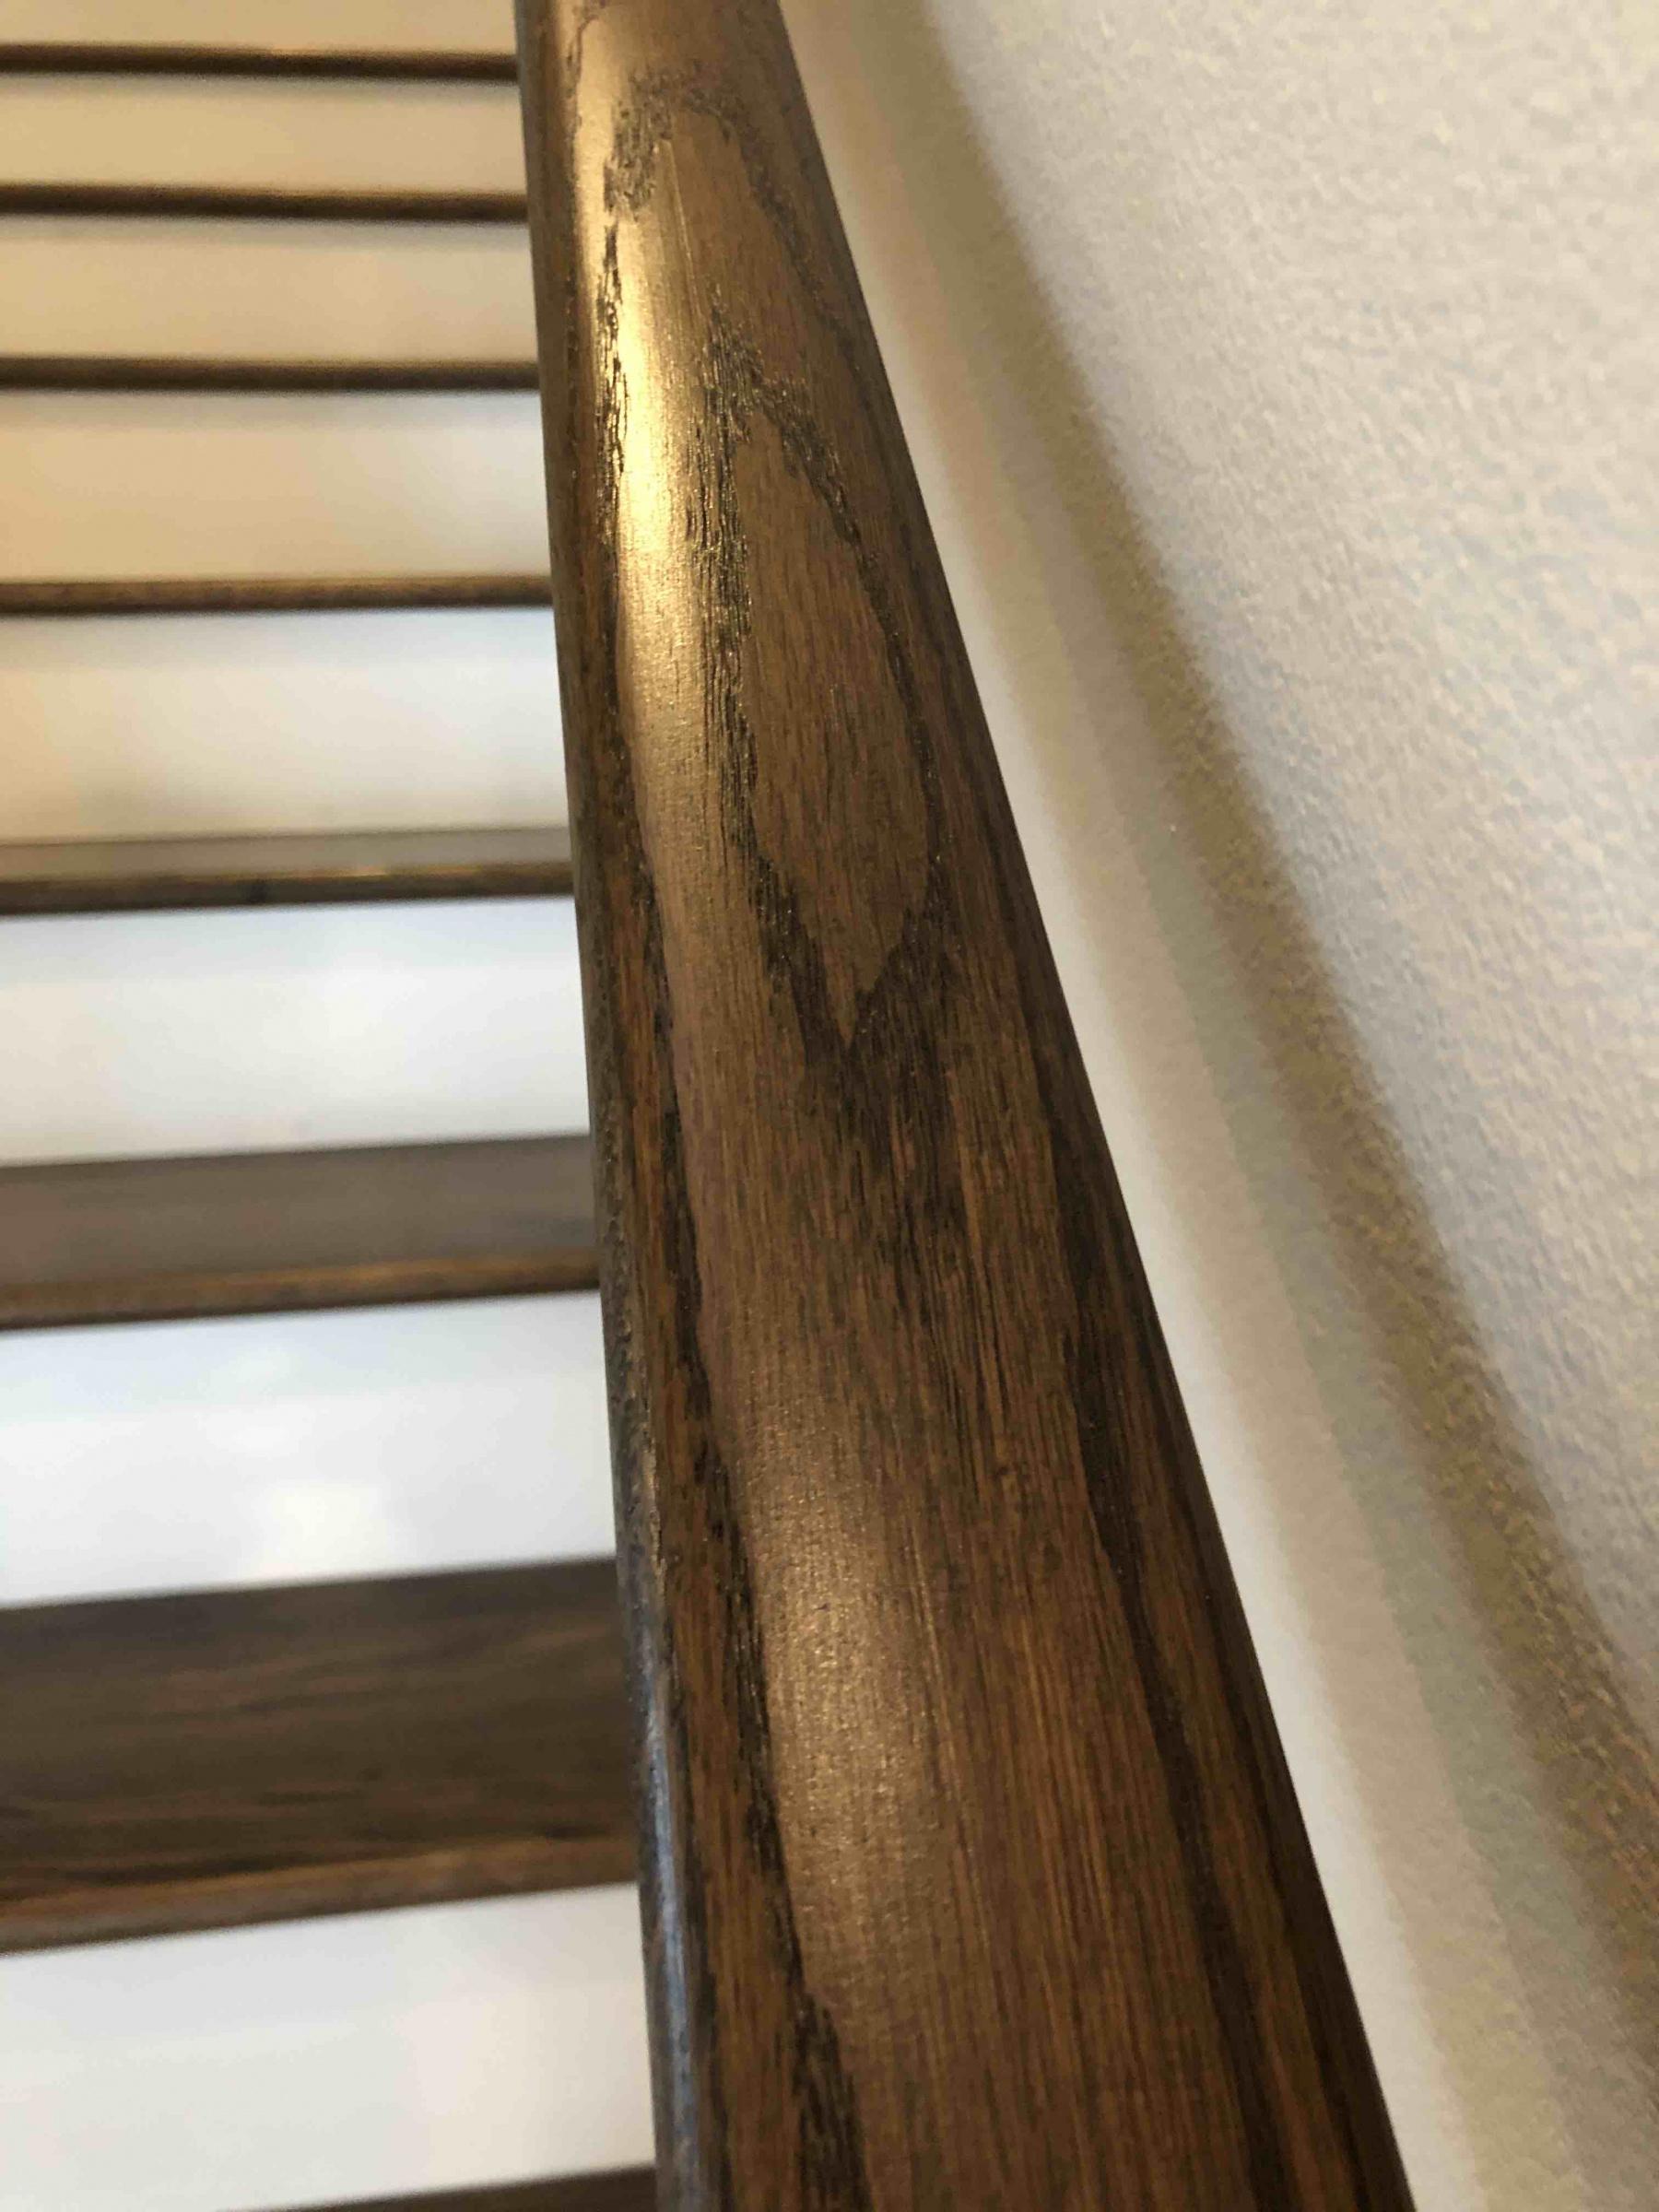 Installing sloped oak railing with banisters-r1.jpg